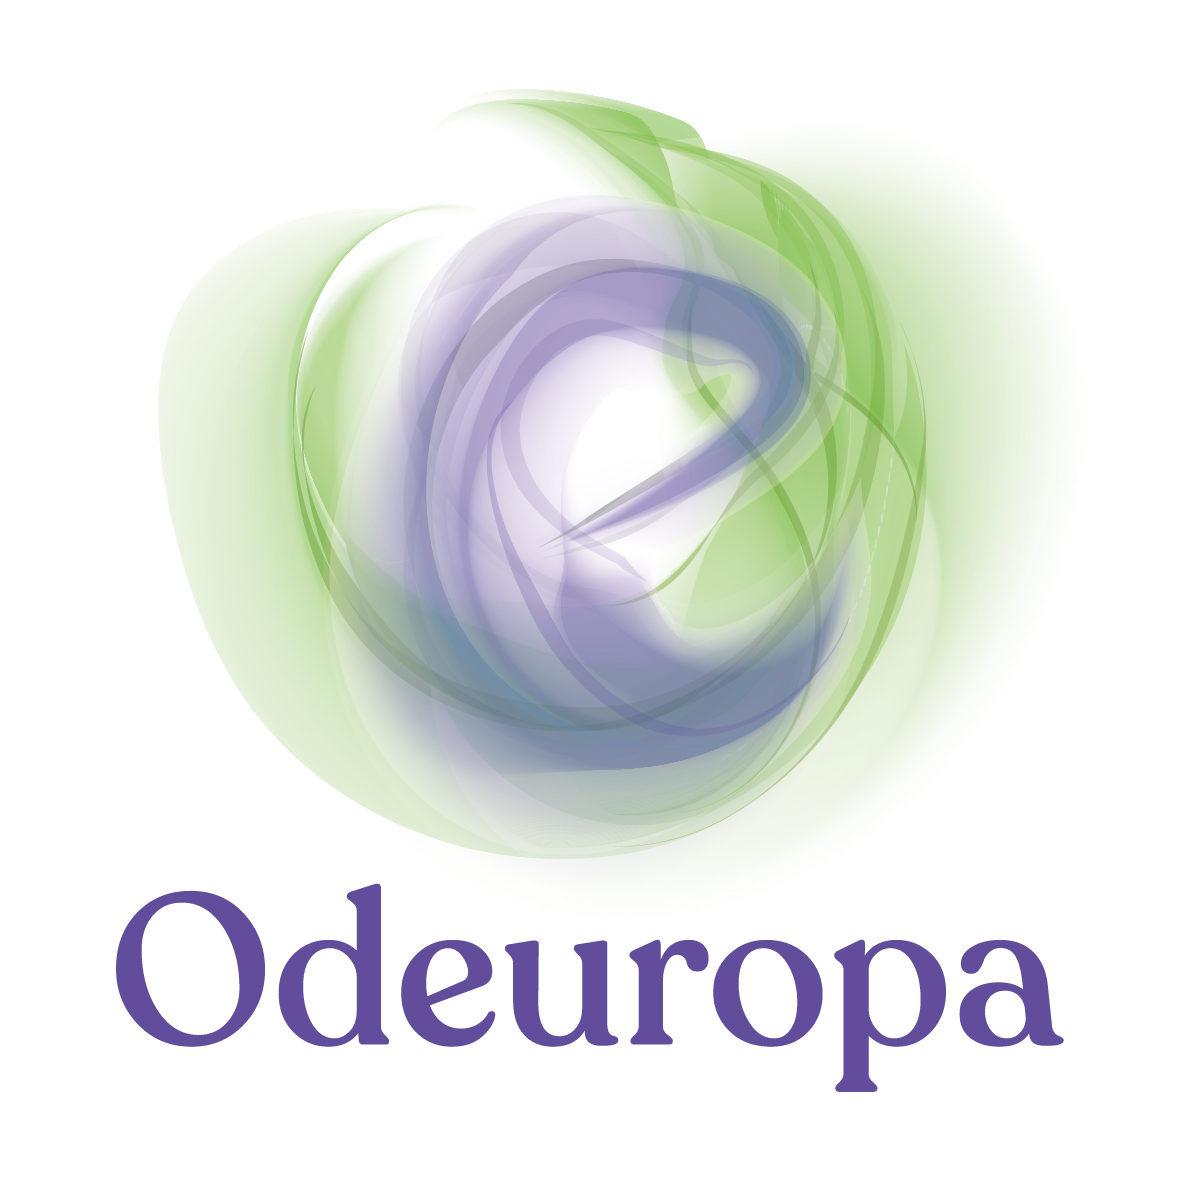 Odeuropa